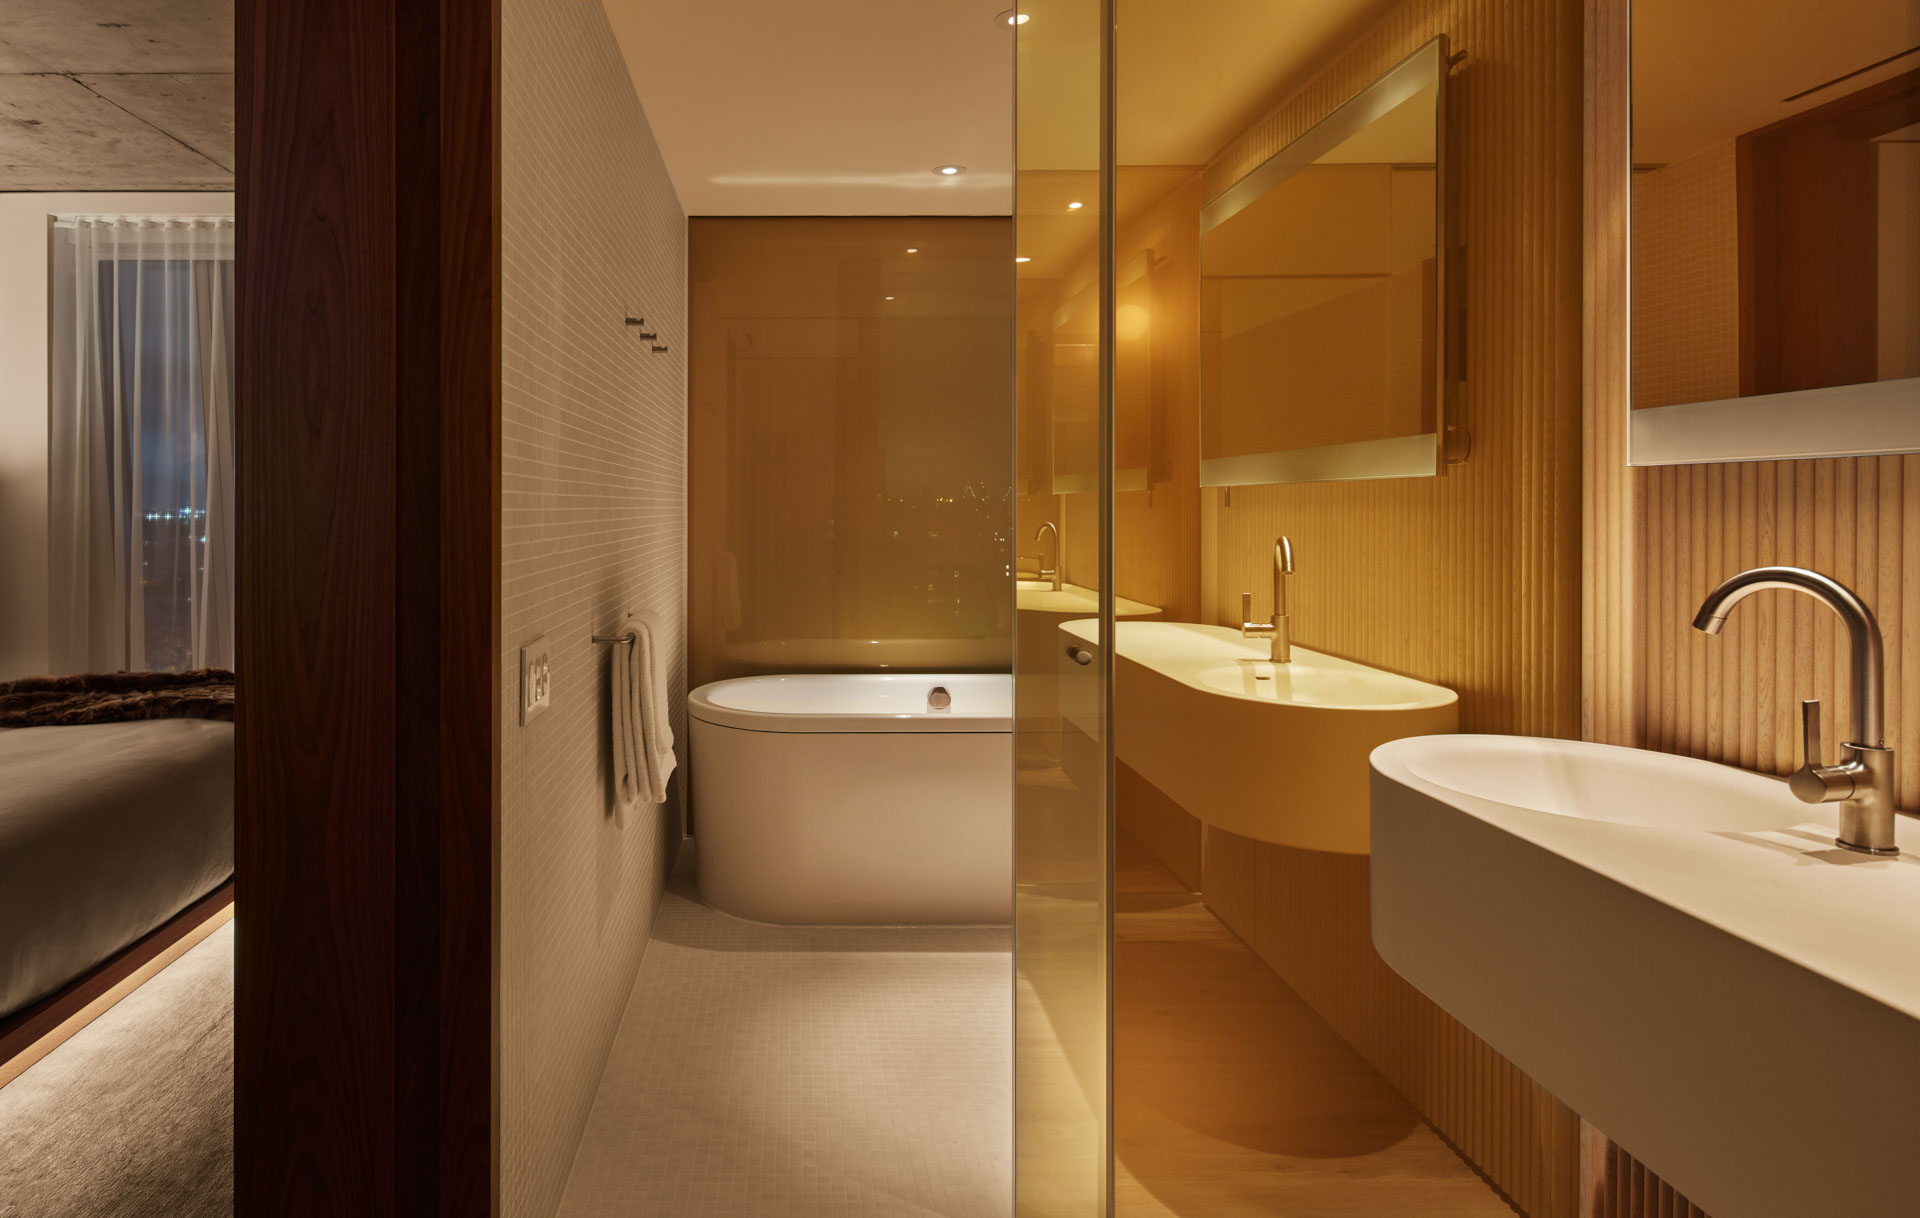 10-PUBLIC Hotel New York City - Suite Bathroom - © Nicholas Koenig.jpg